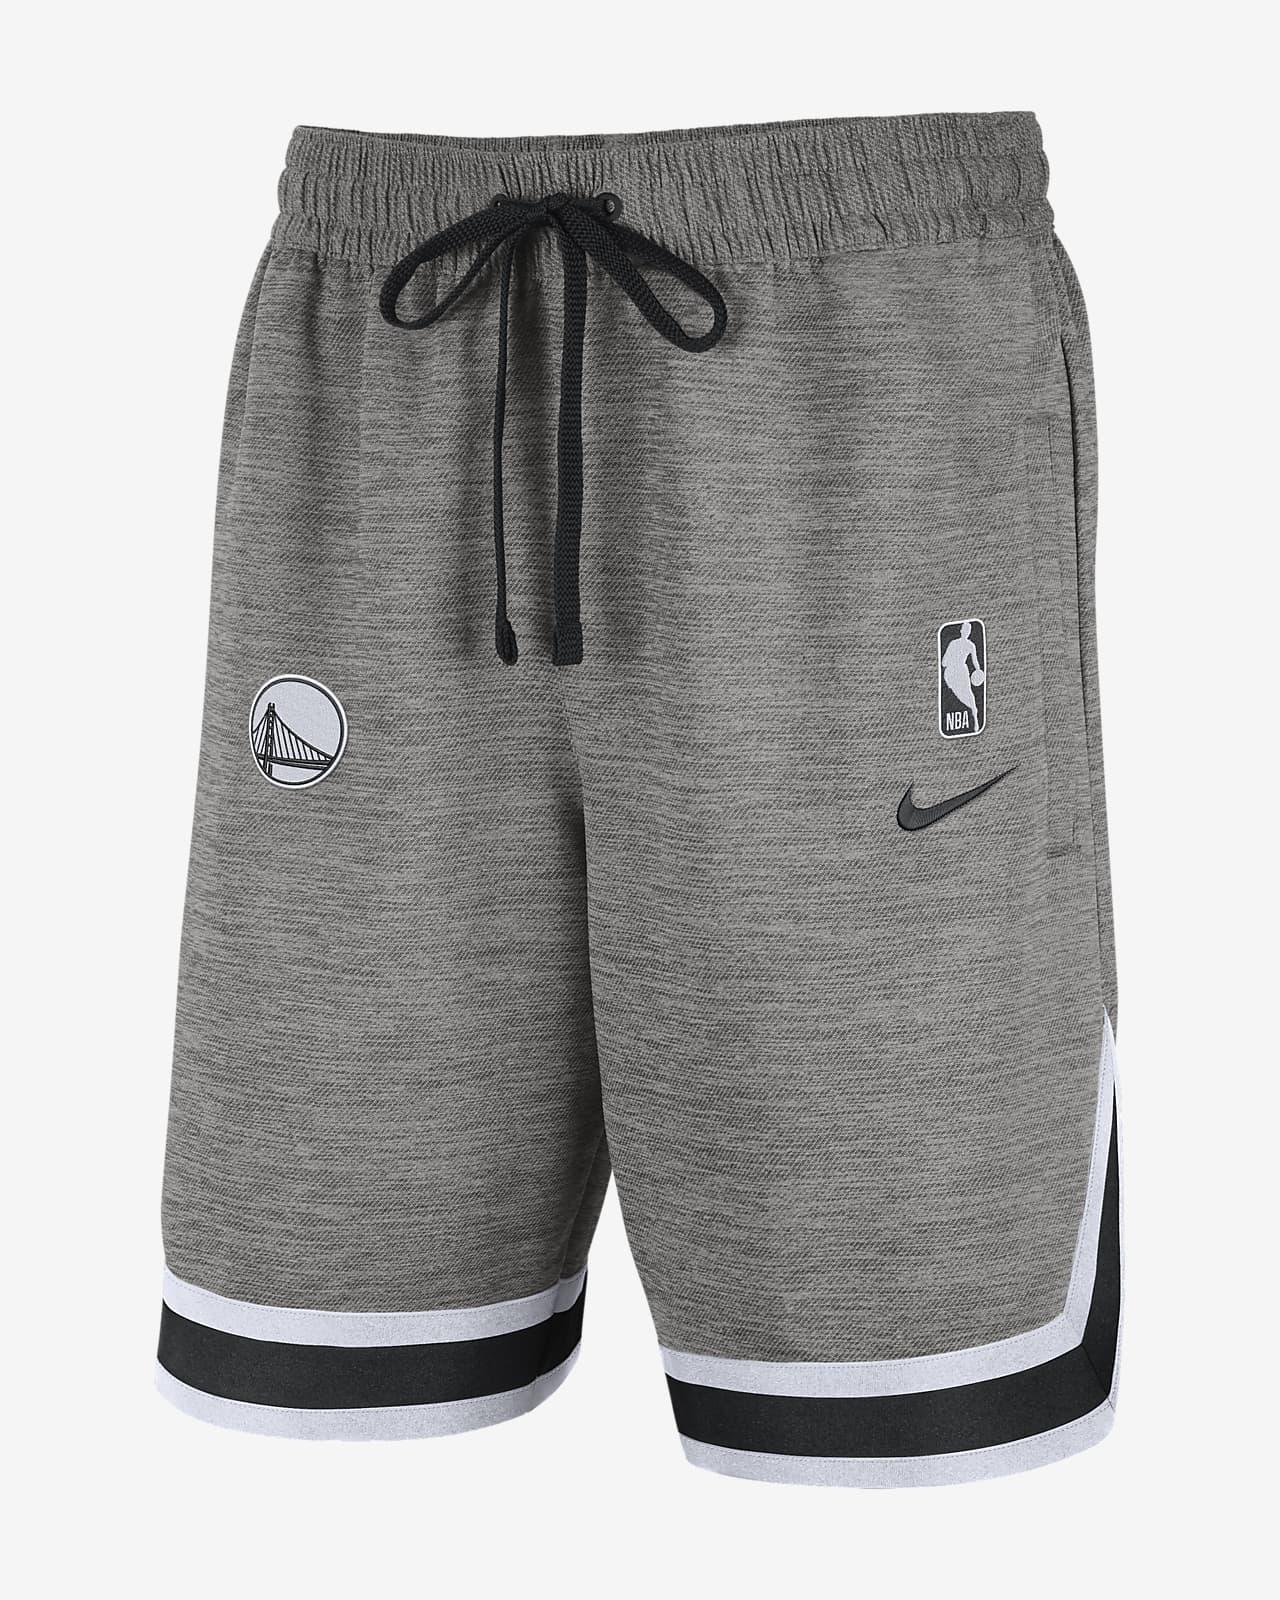 Warriors Men's Nike Therma Flex NBA Shorts